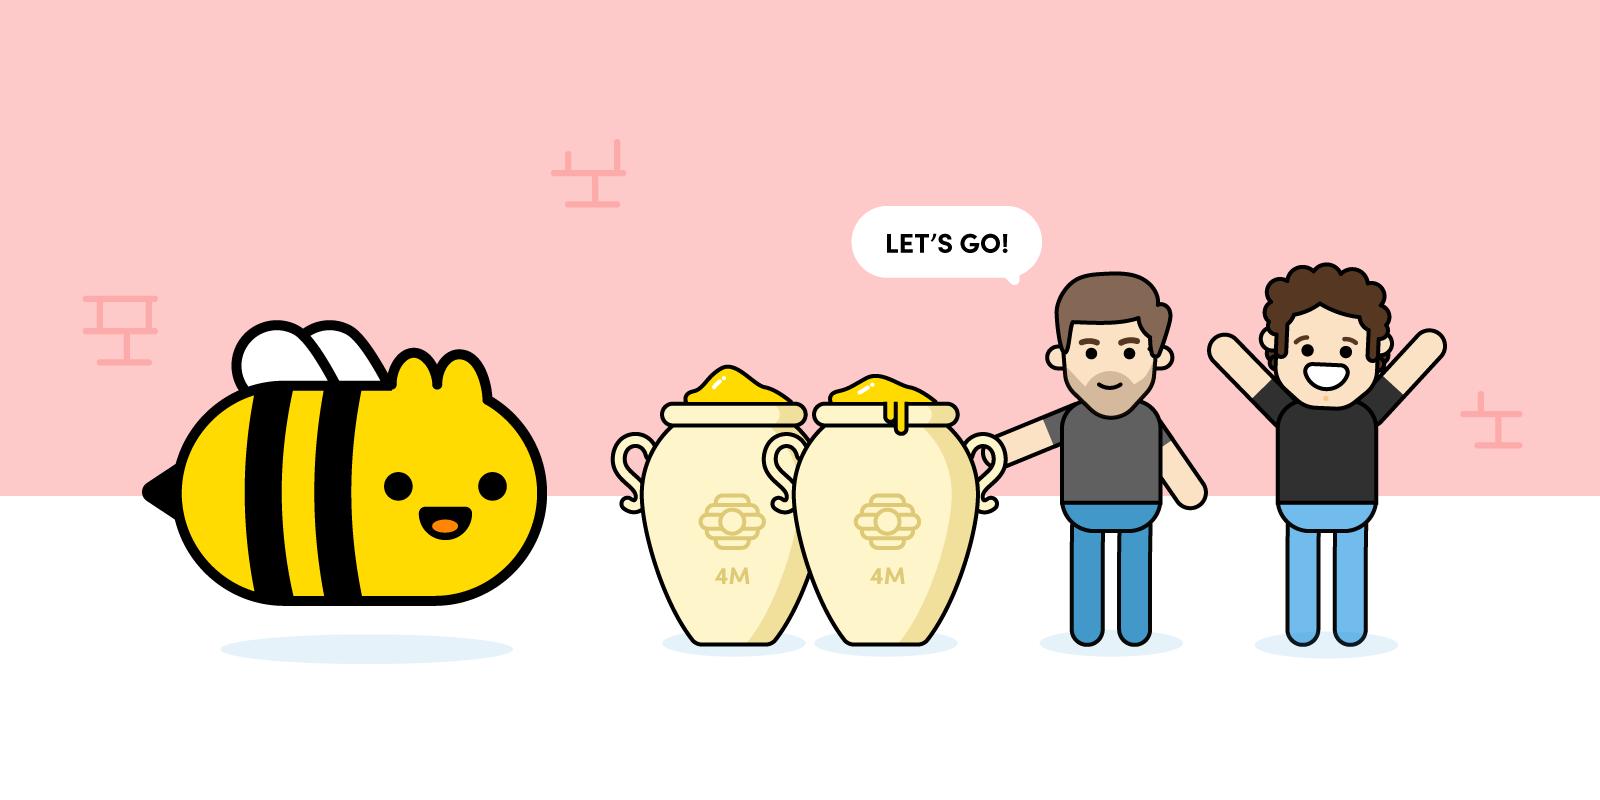 Tom and Scott investing in honey